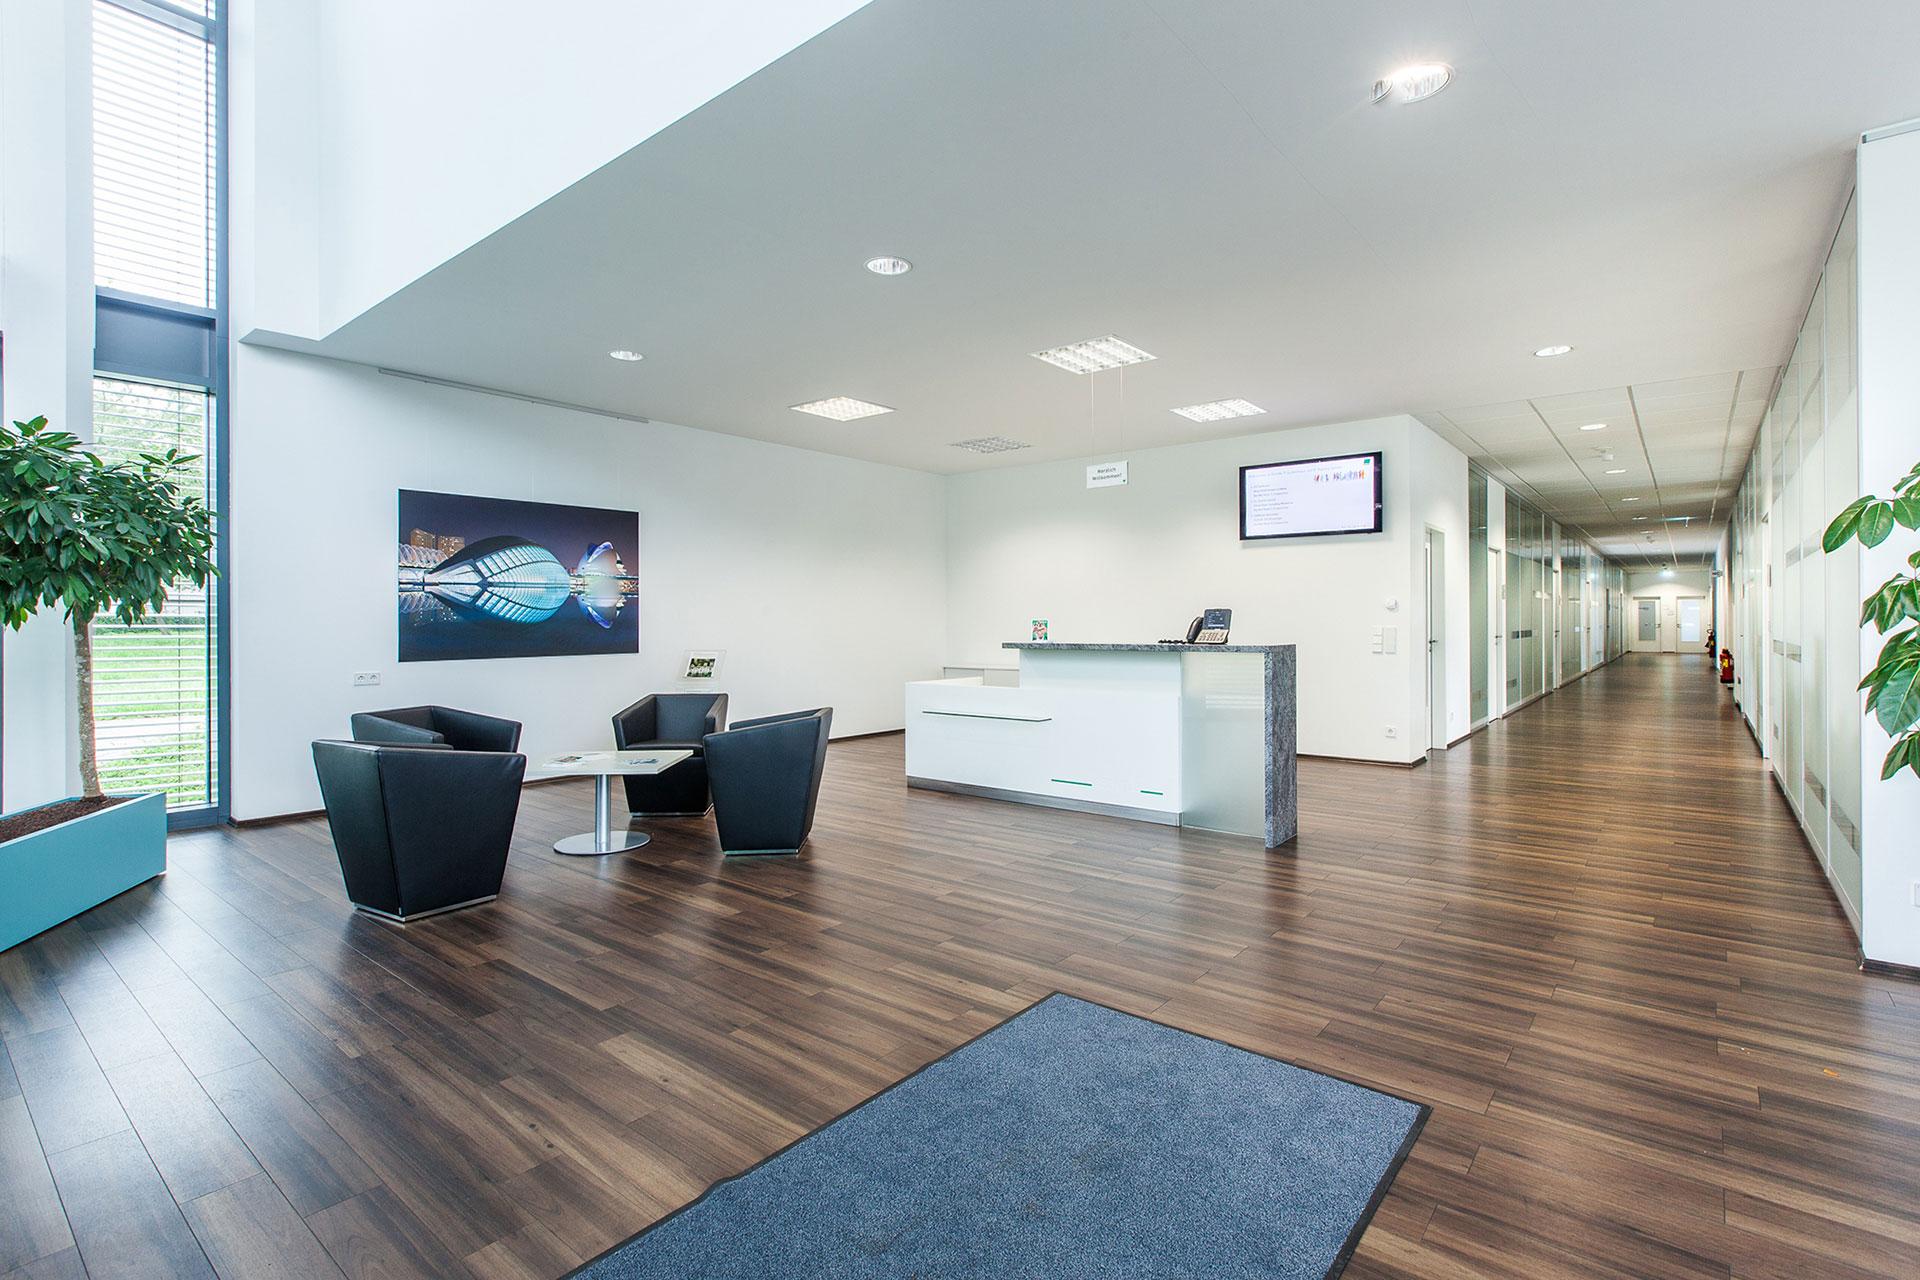 Bechtle GmbH & Co. KG IT-Systemhaus Karlsruhe